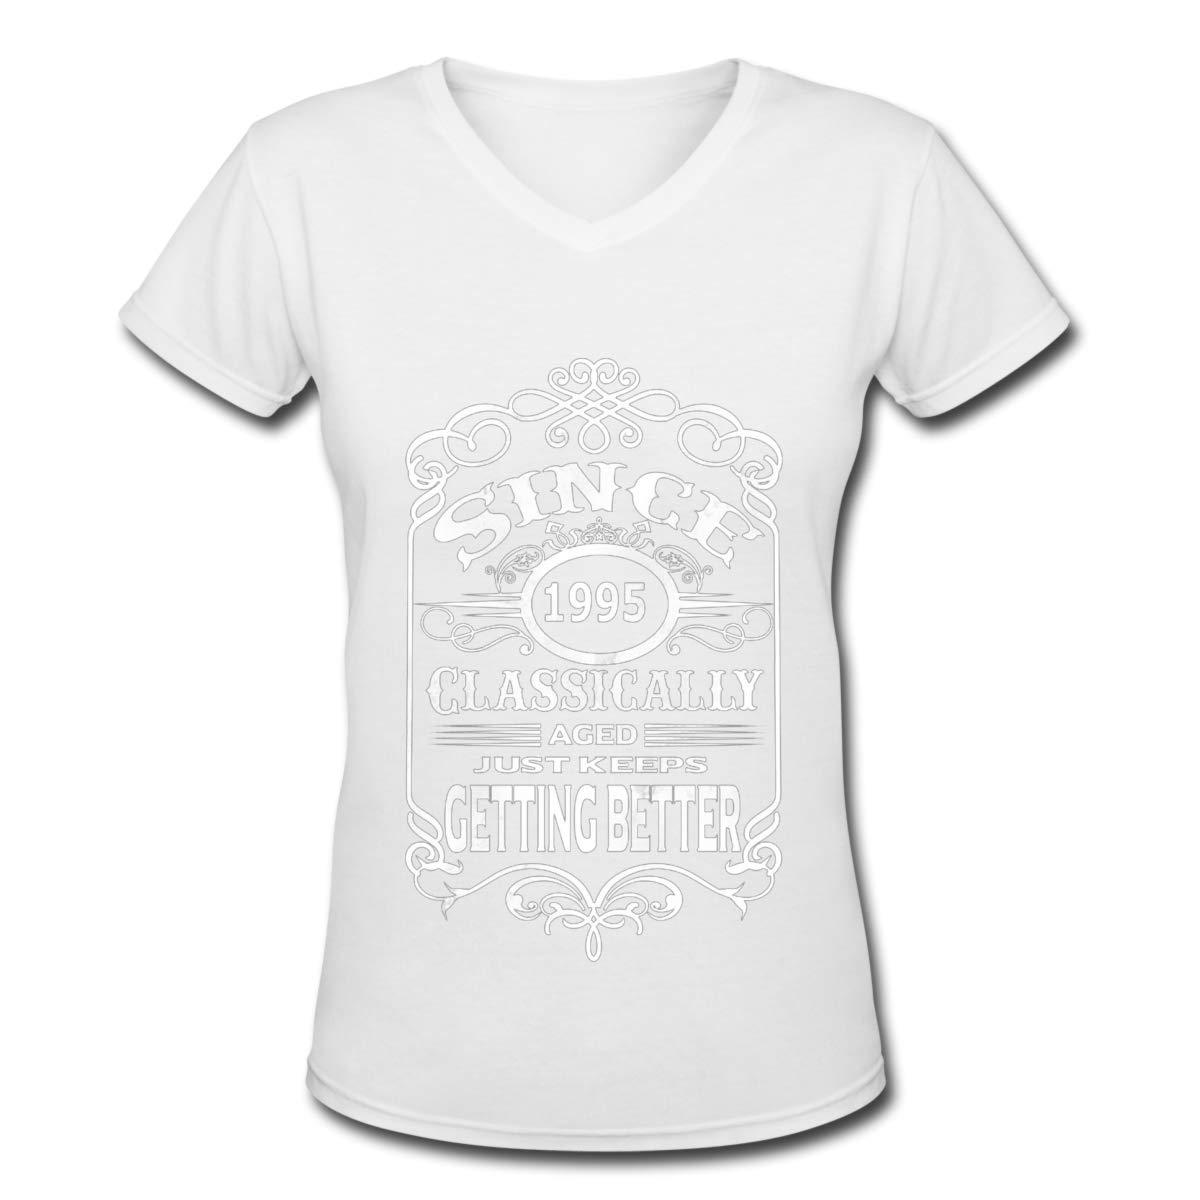 YONG-SHOP 1995 Birthday Gift Womens T Shirt Casual Cotton Short Sleeve V-Neck Graphic T-Shirt Tops Tees